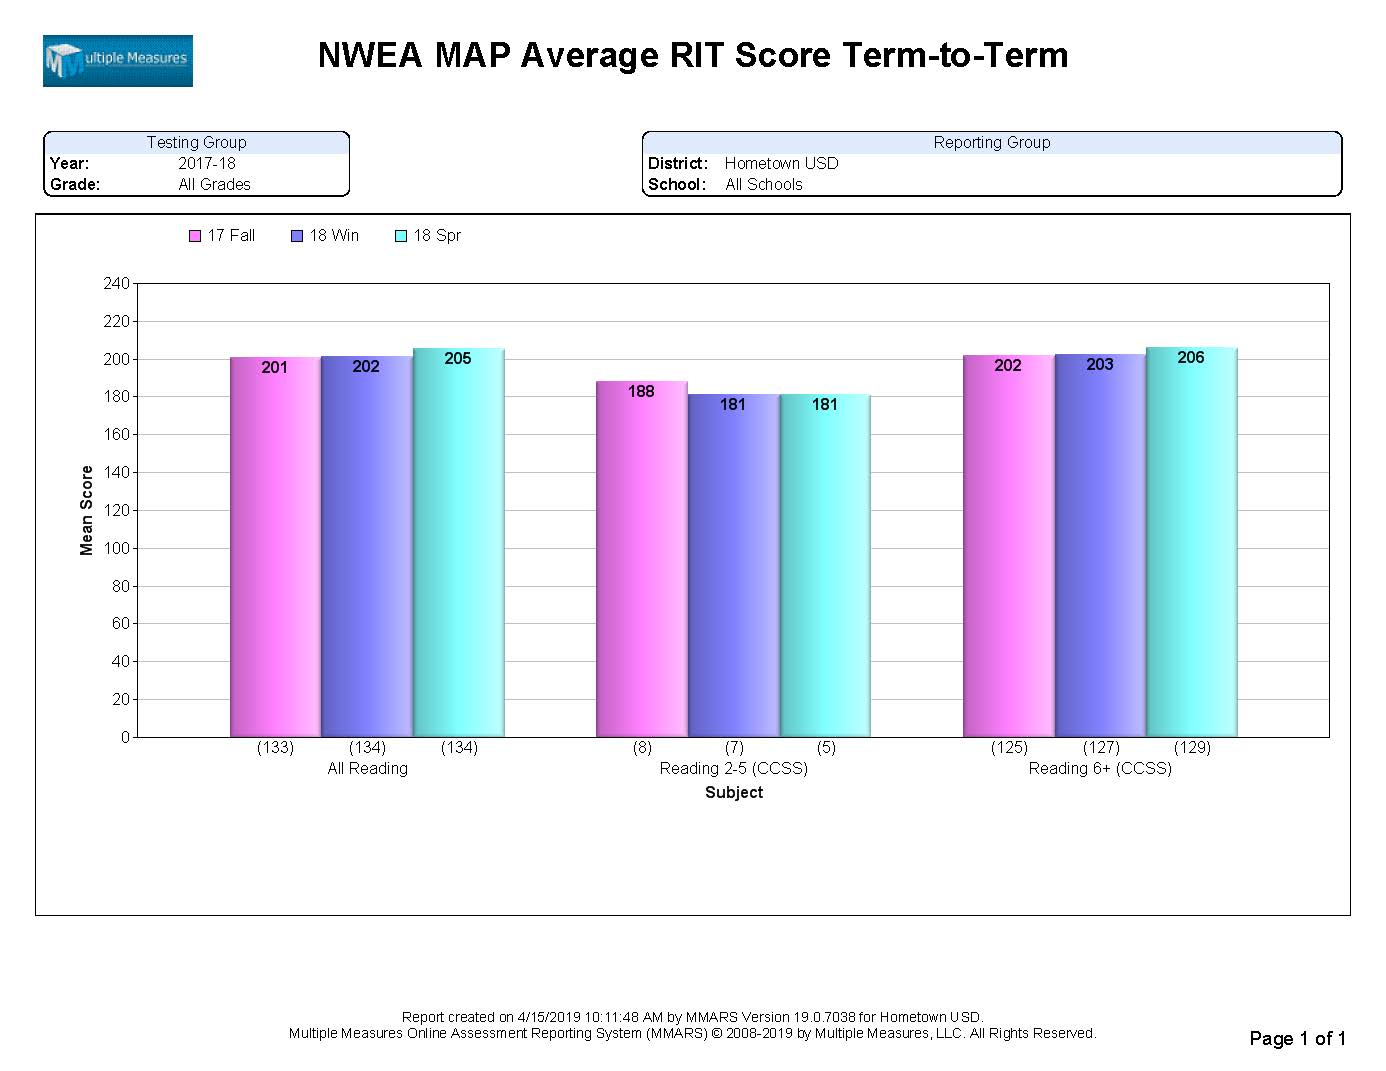 NWEA-Summary_AvgRIT_T2T_CATALOG.jpg